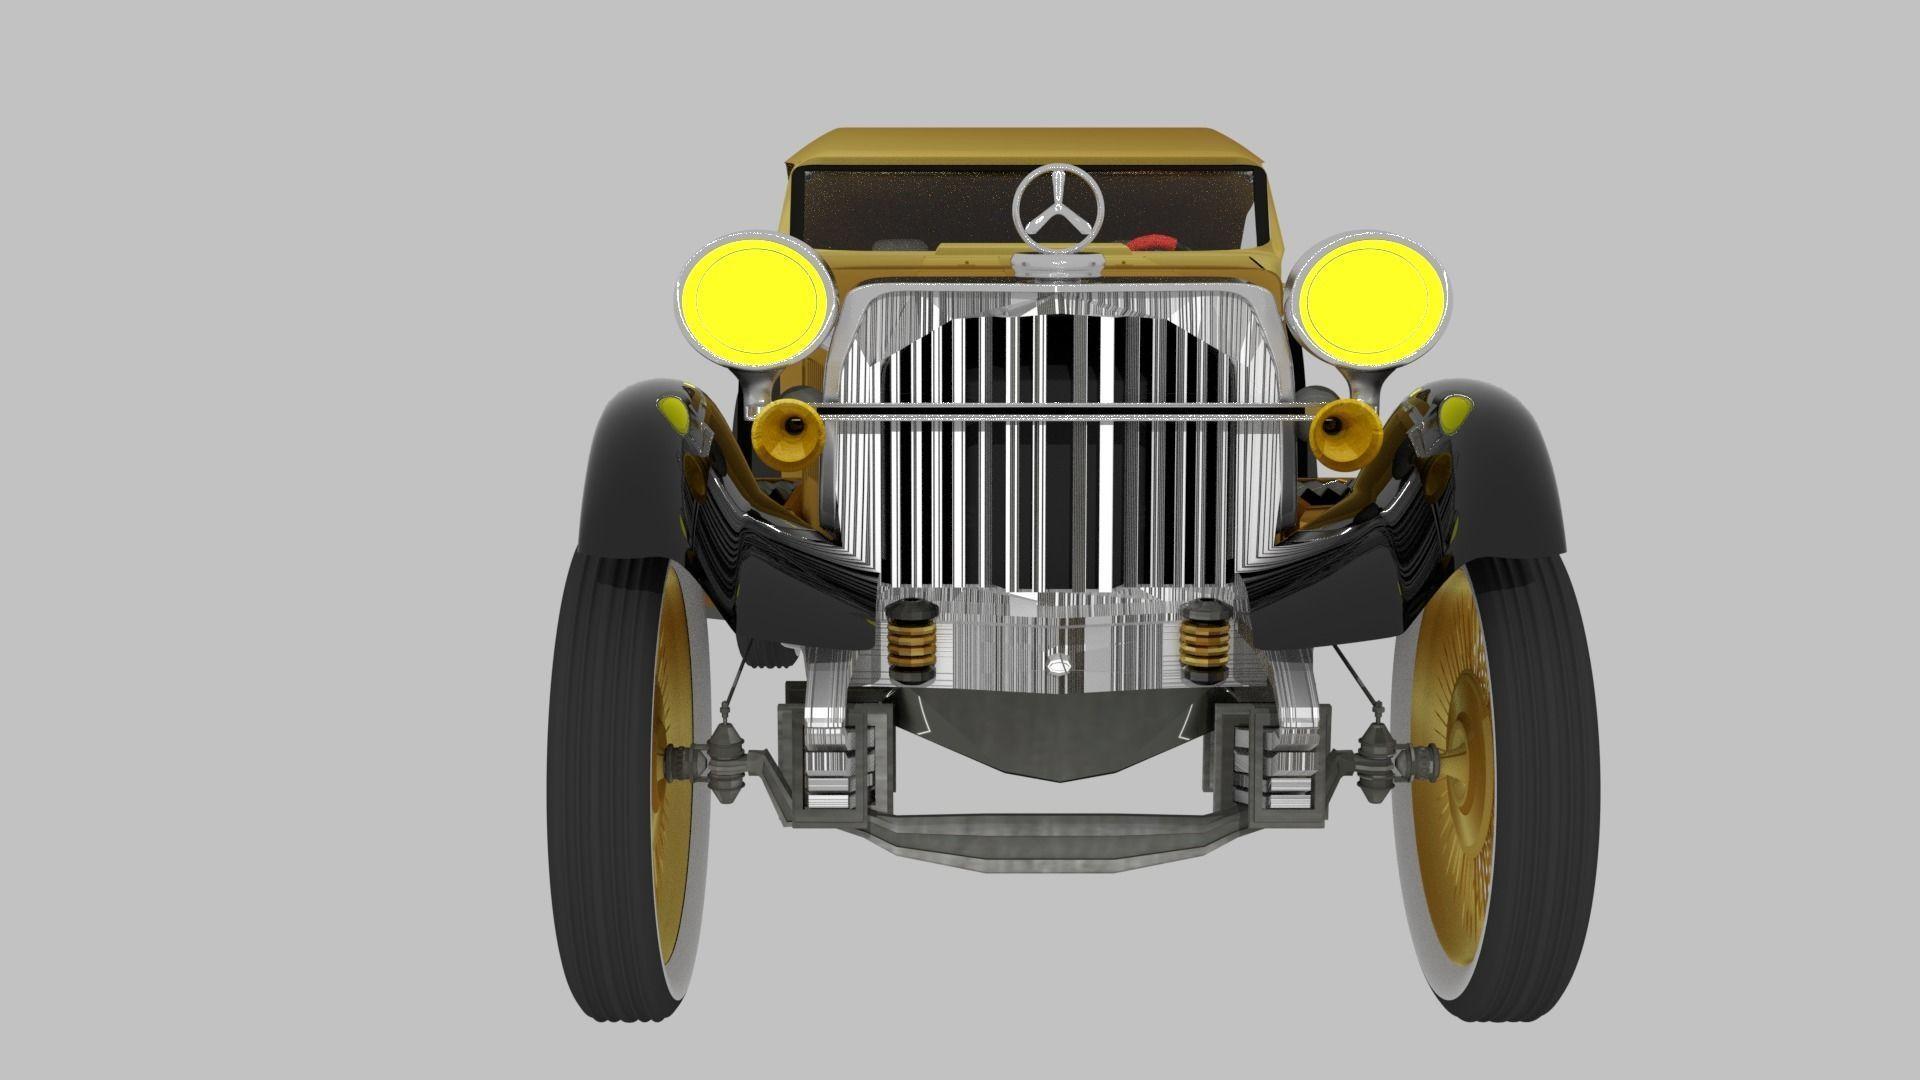 ROADSTER 3D CAR MODEL